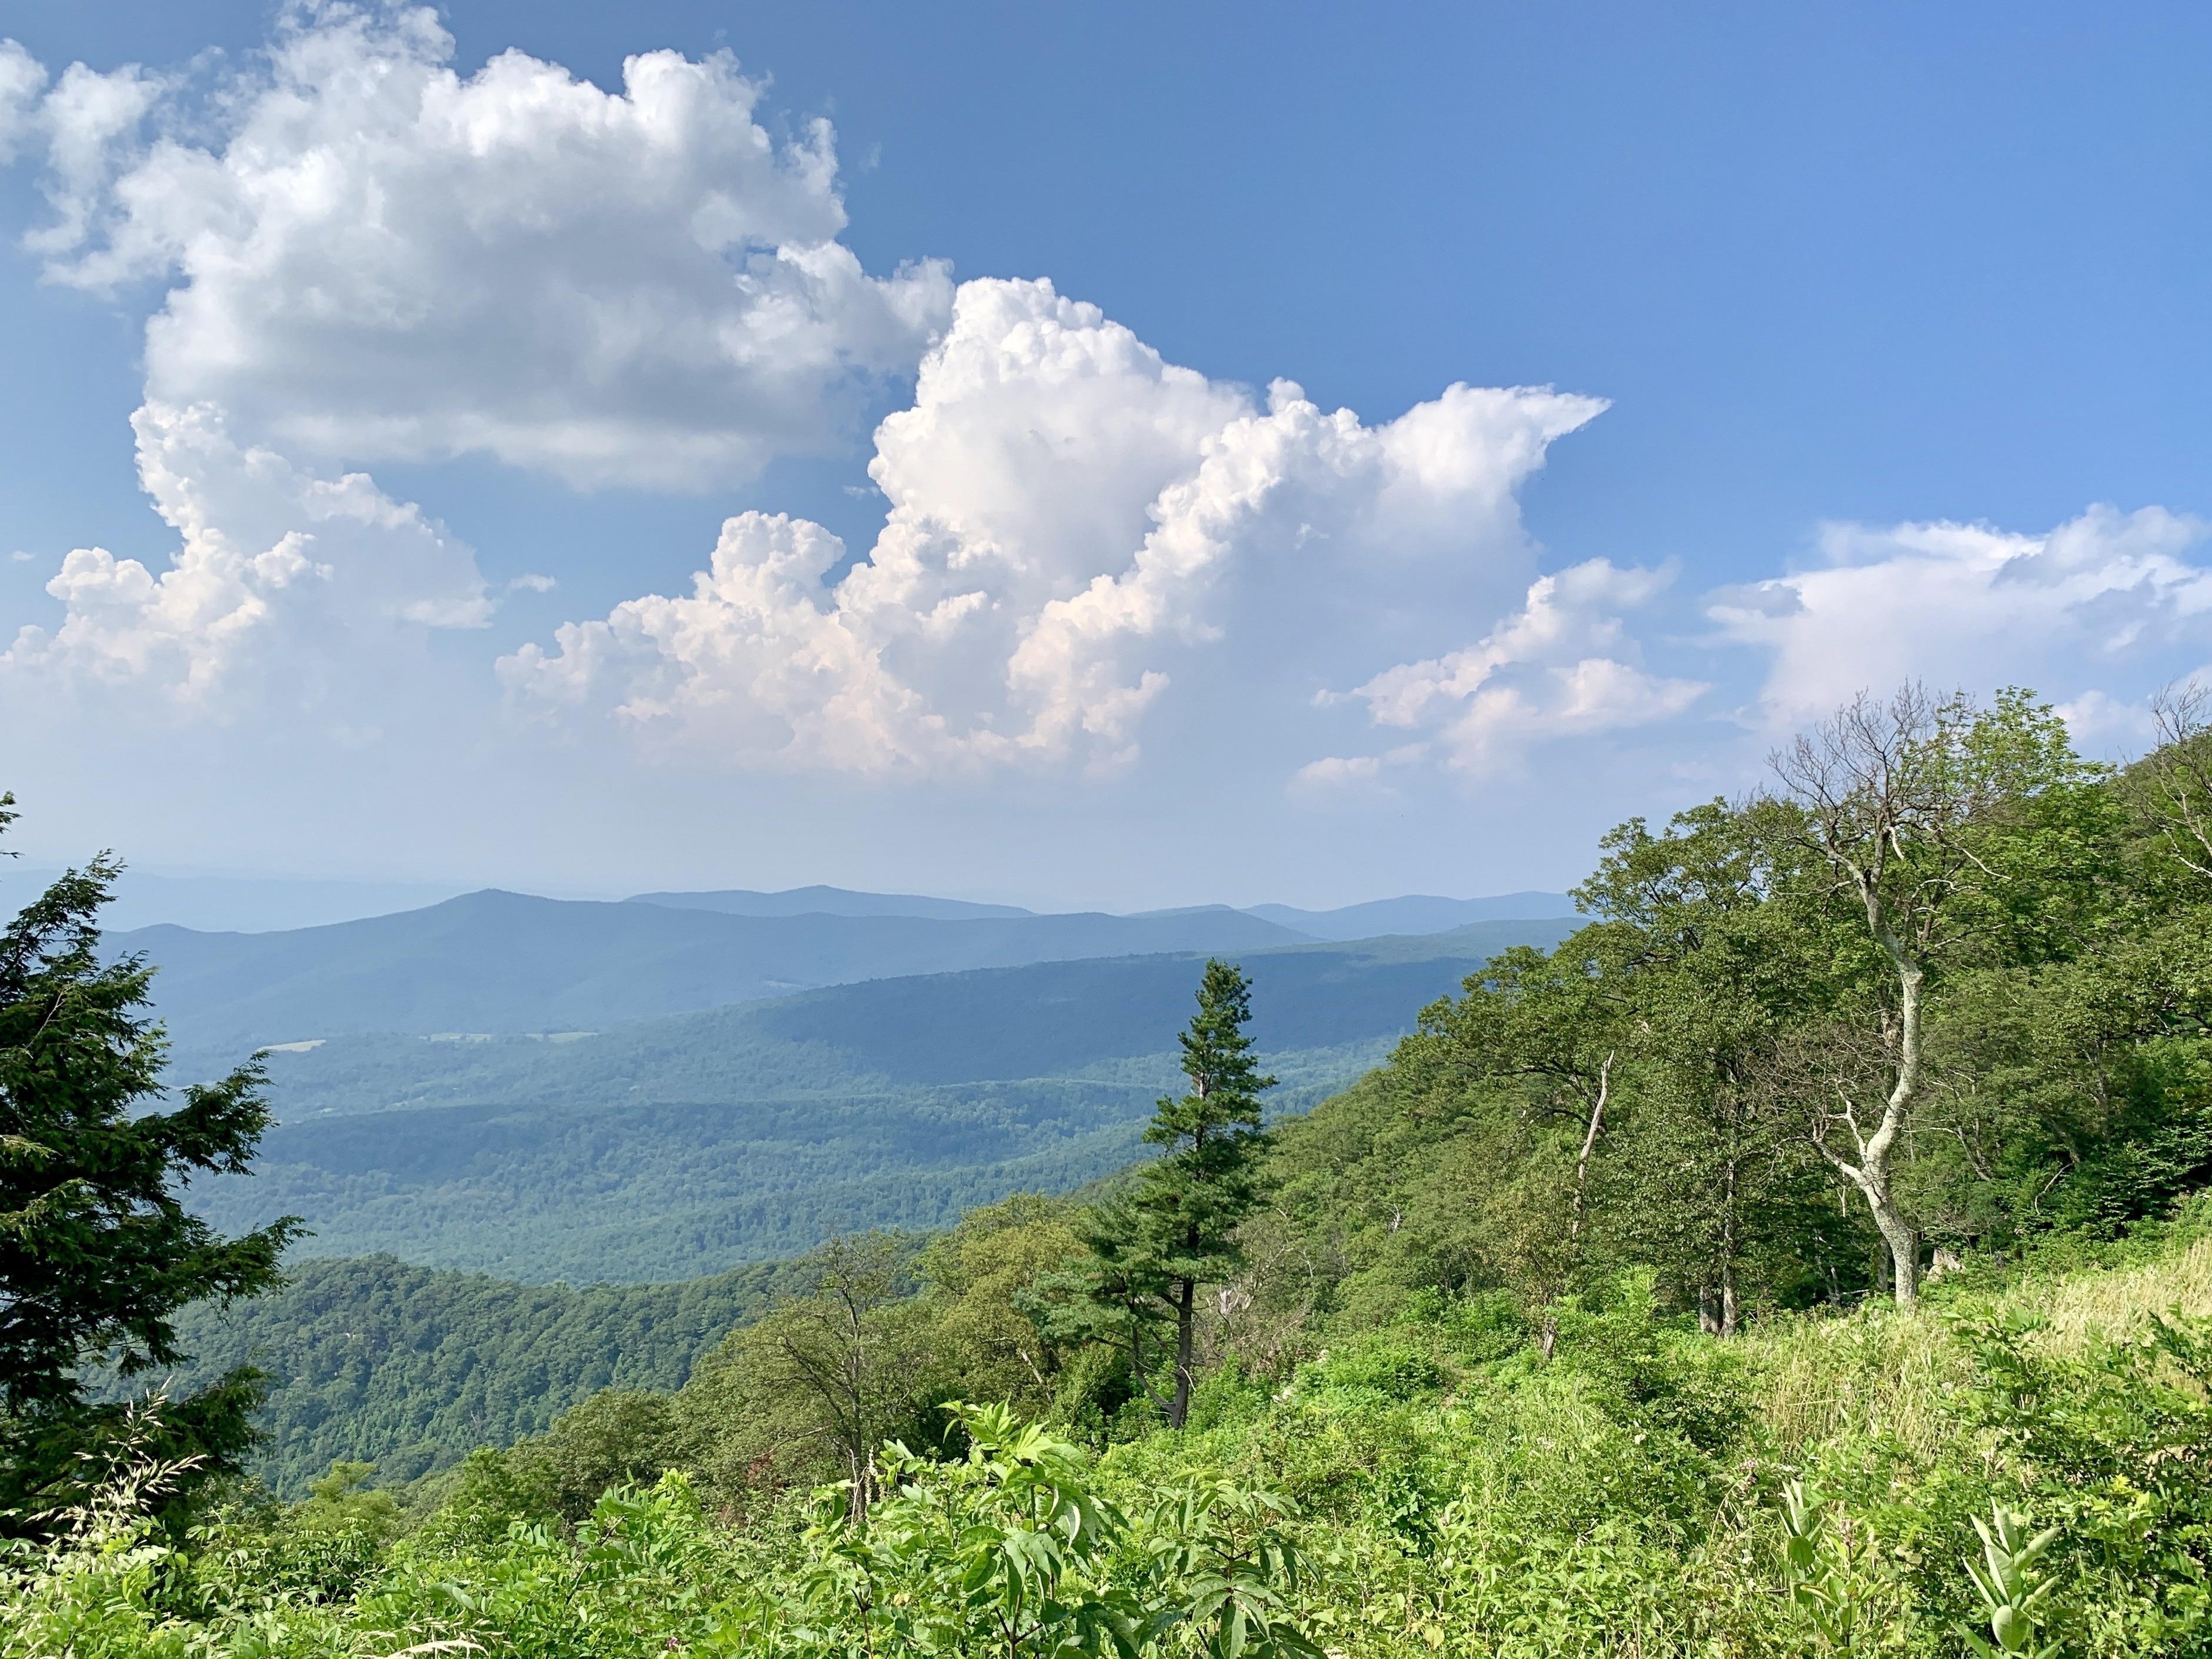 Luray, Virginia, United States of America